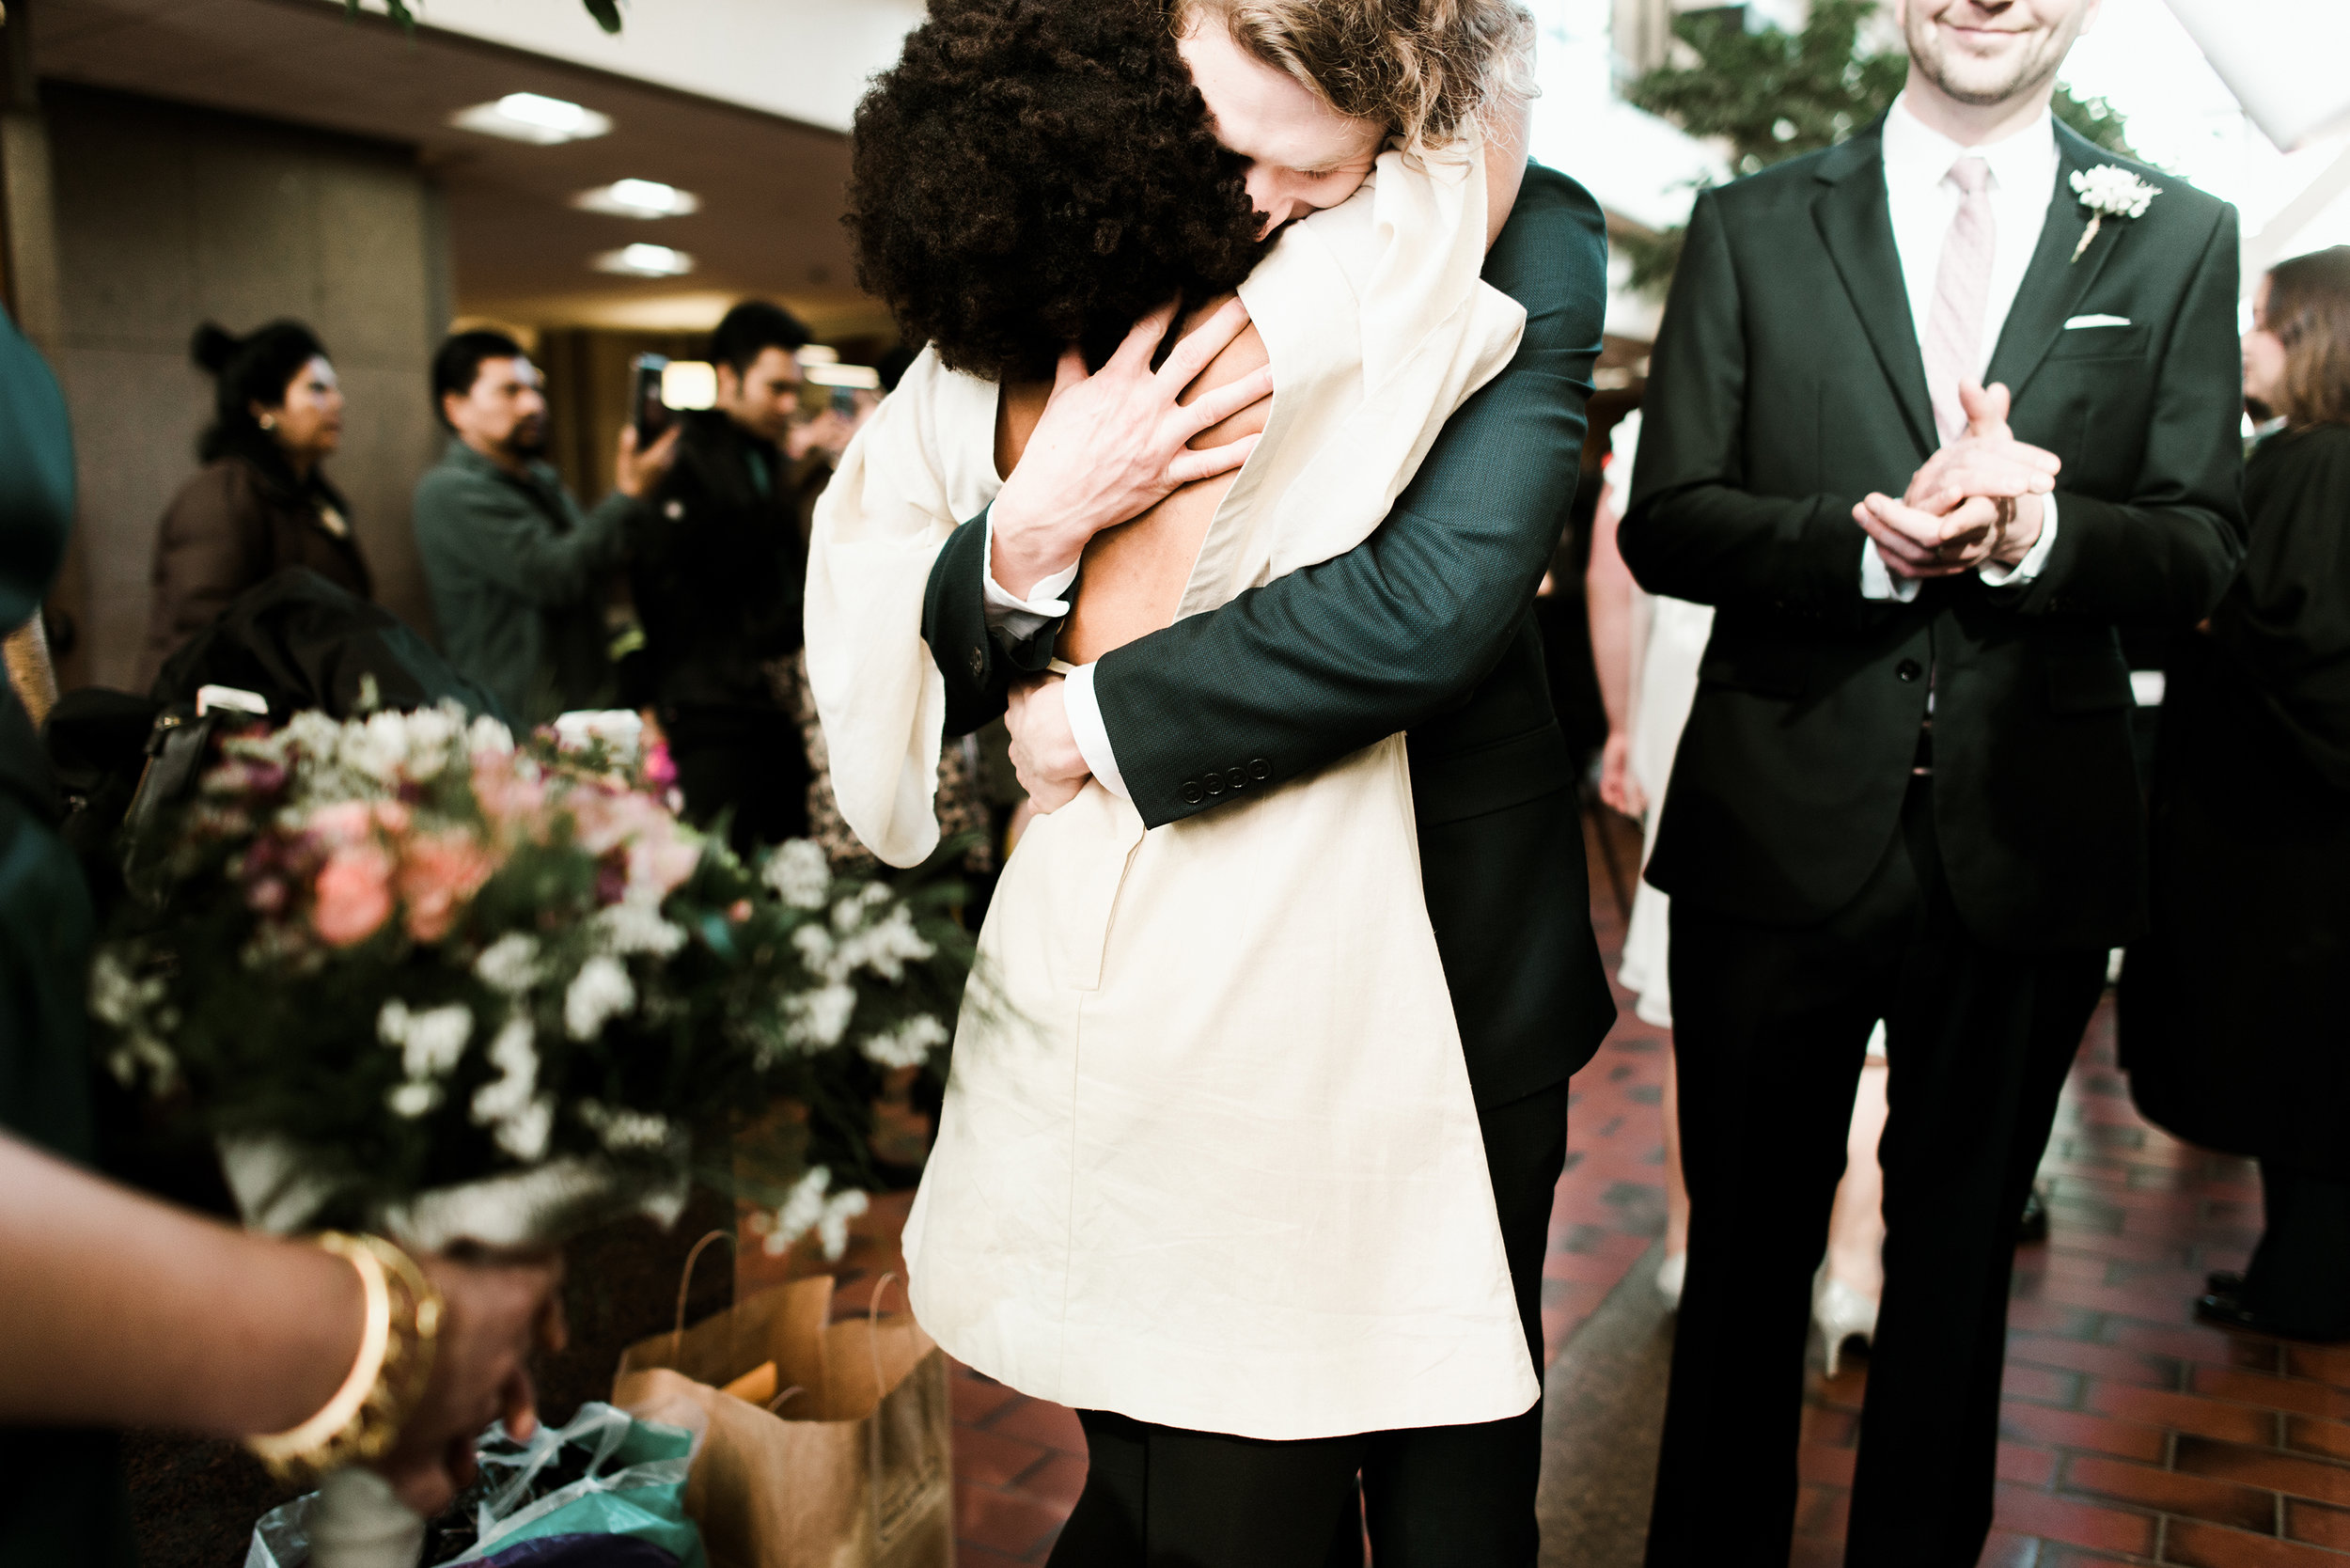 PAT + JULIE - MINNEAPOLIS COURTHOUSE WEDDING